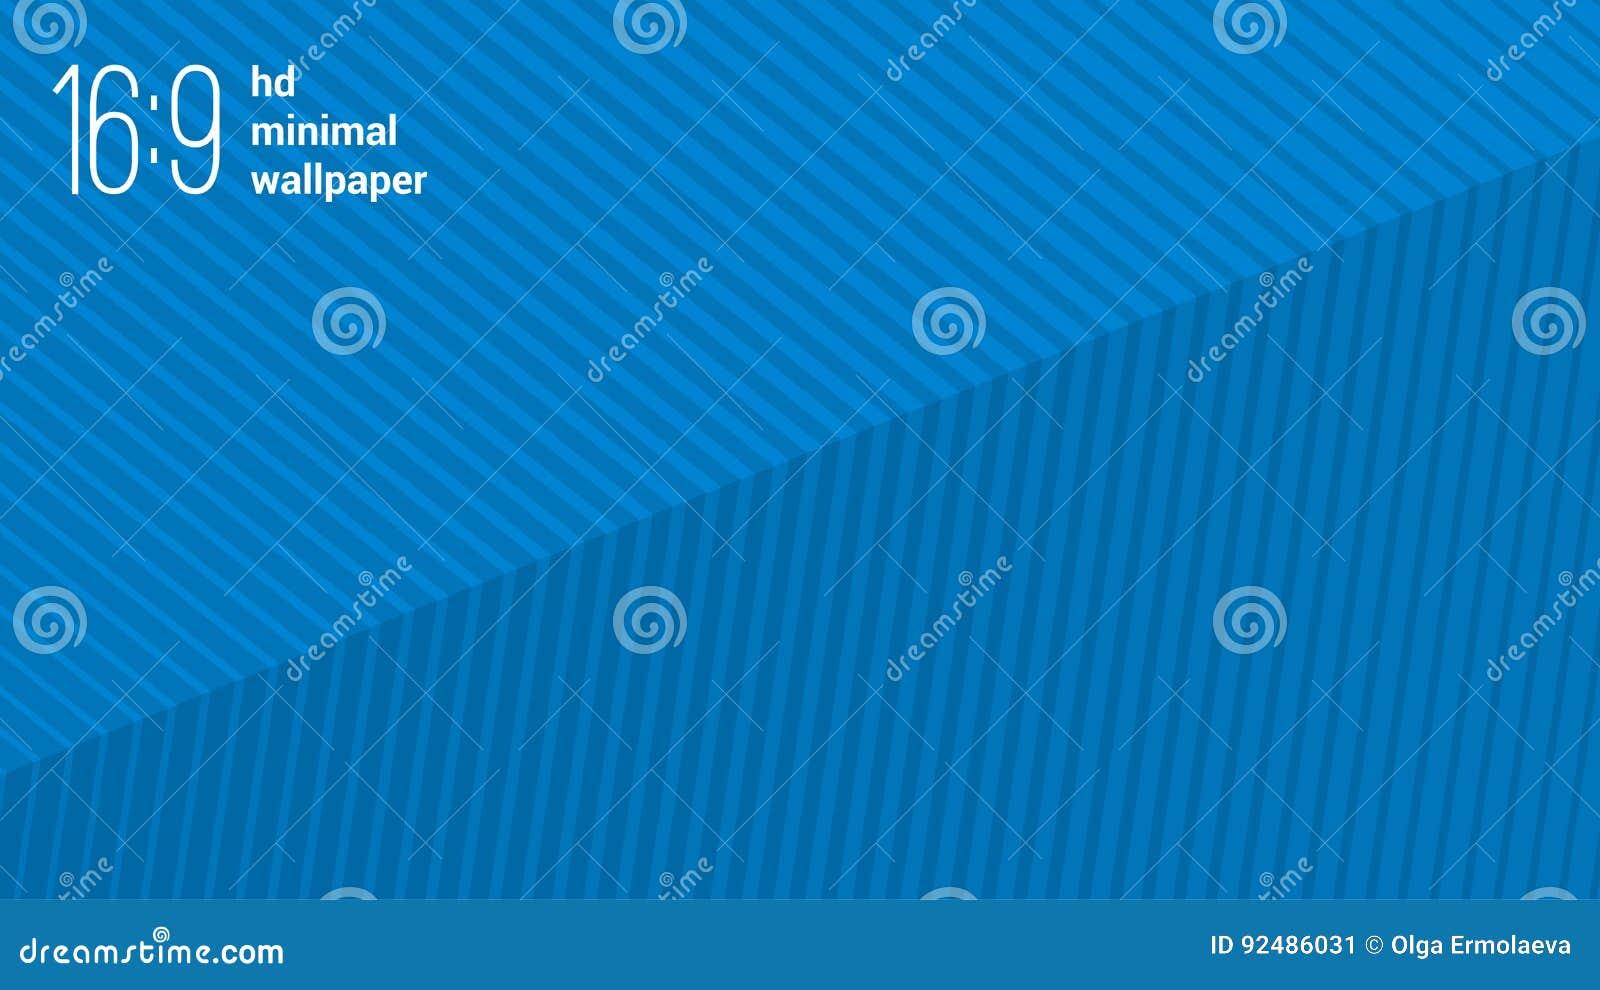 Minimalist Flat Design Hd Wallpaper Vector Background Template